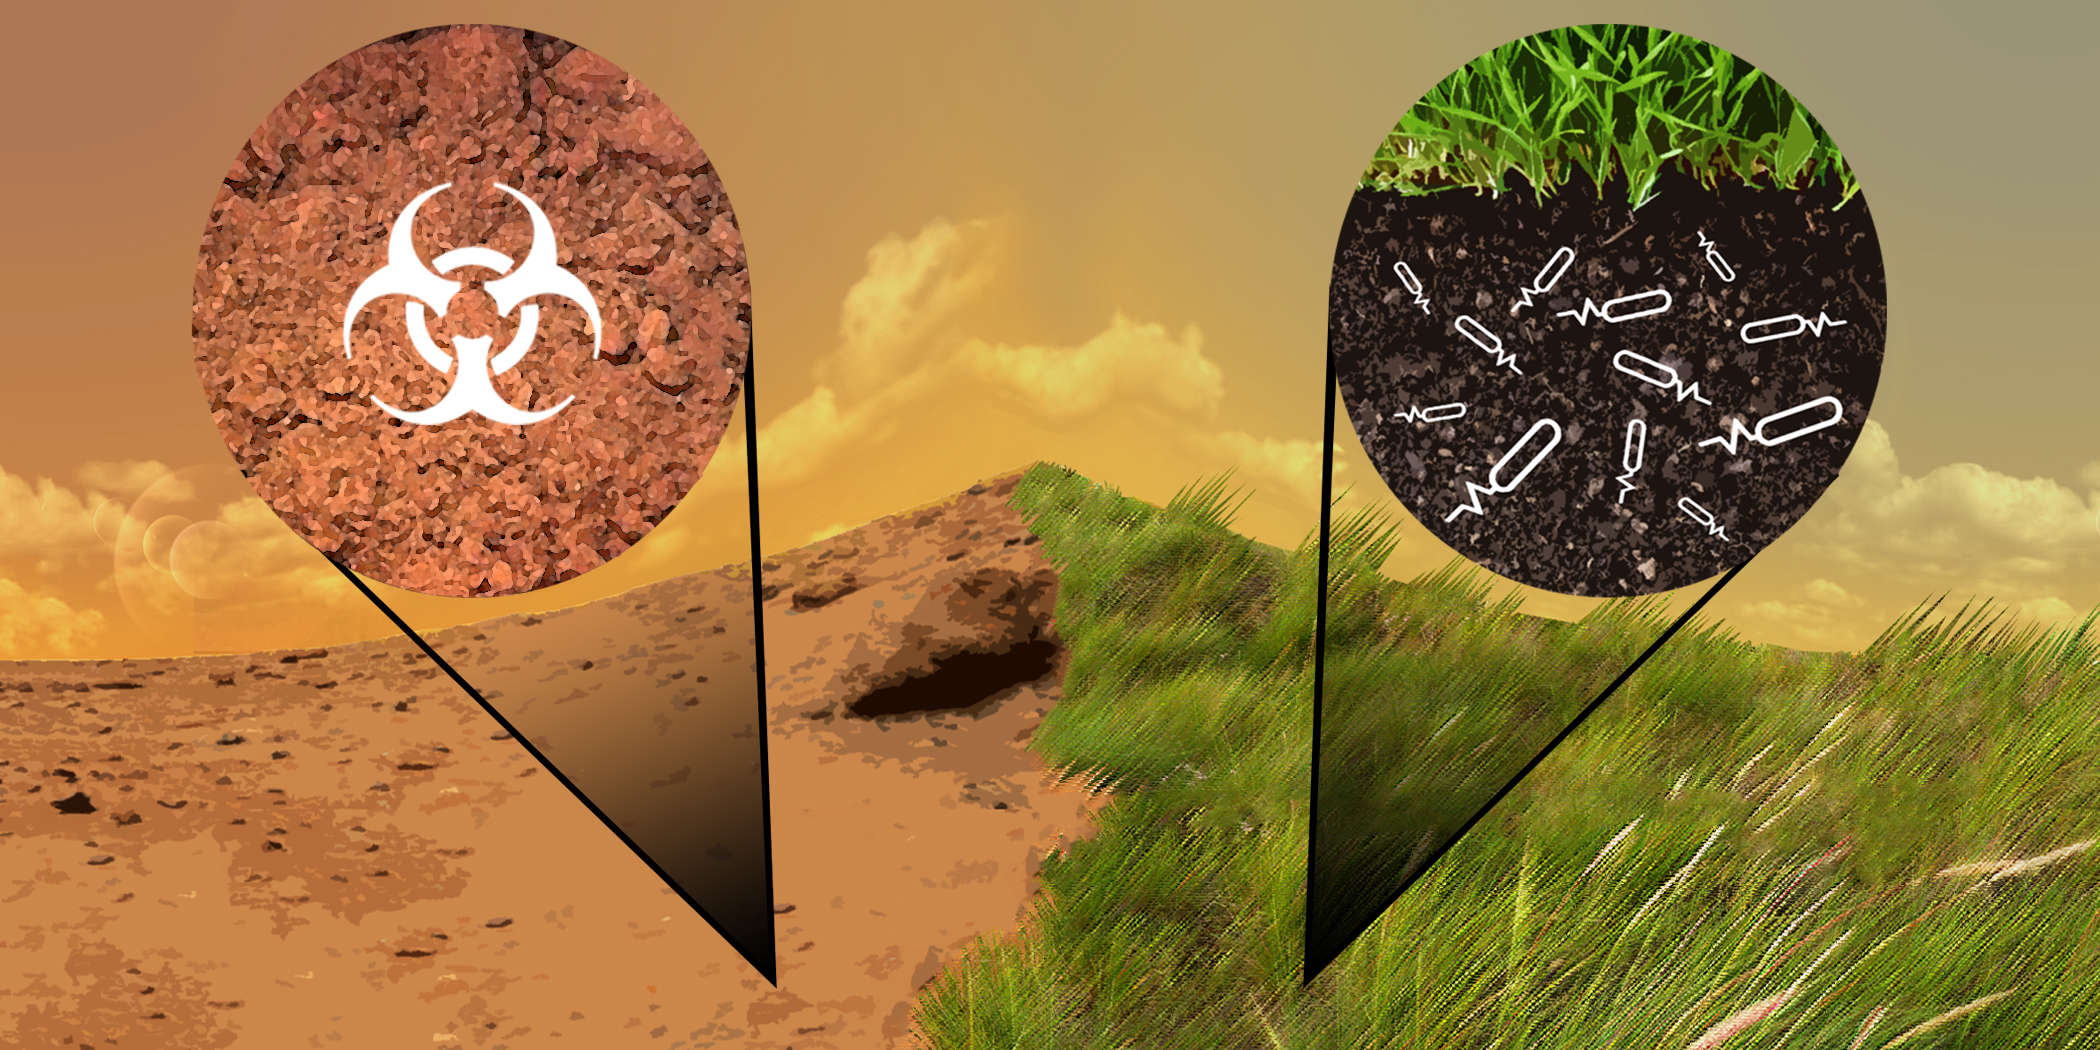 Enrichment of Martian Regolith to Useful Agricultural Soil